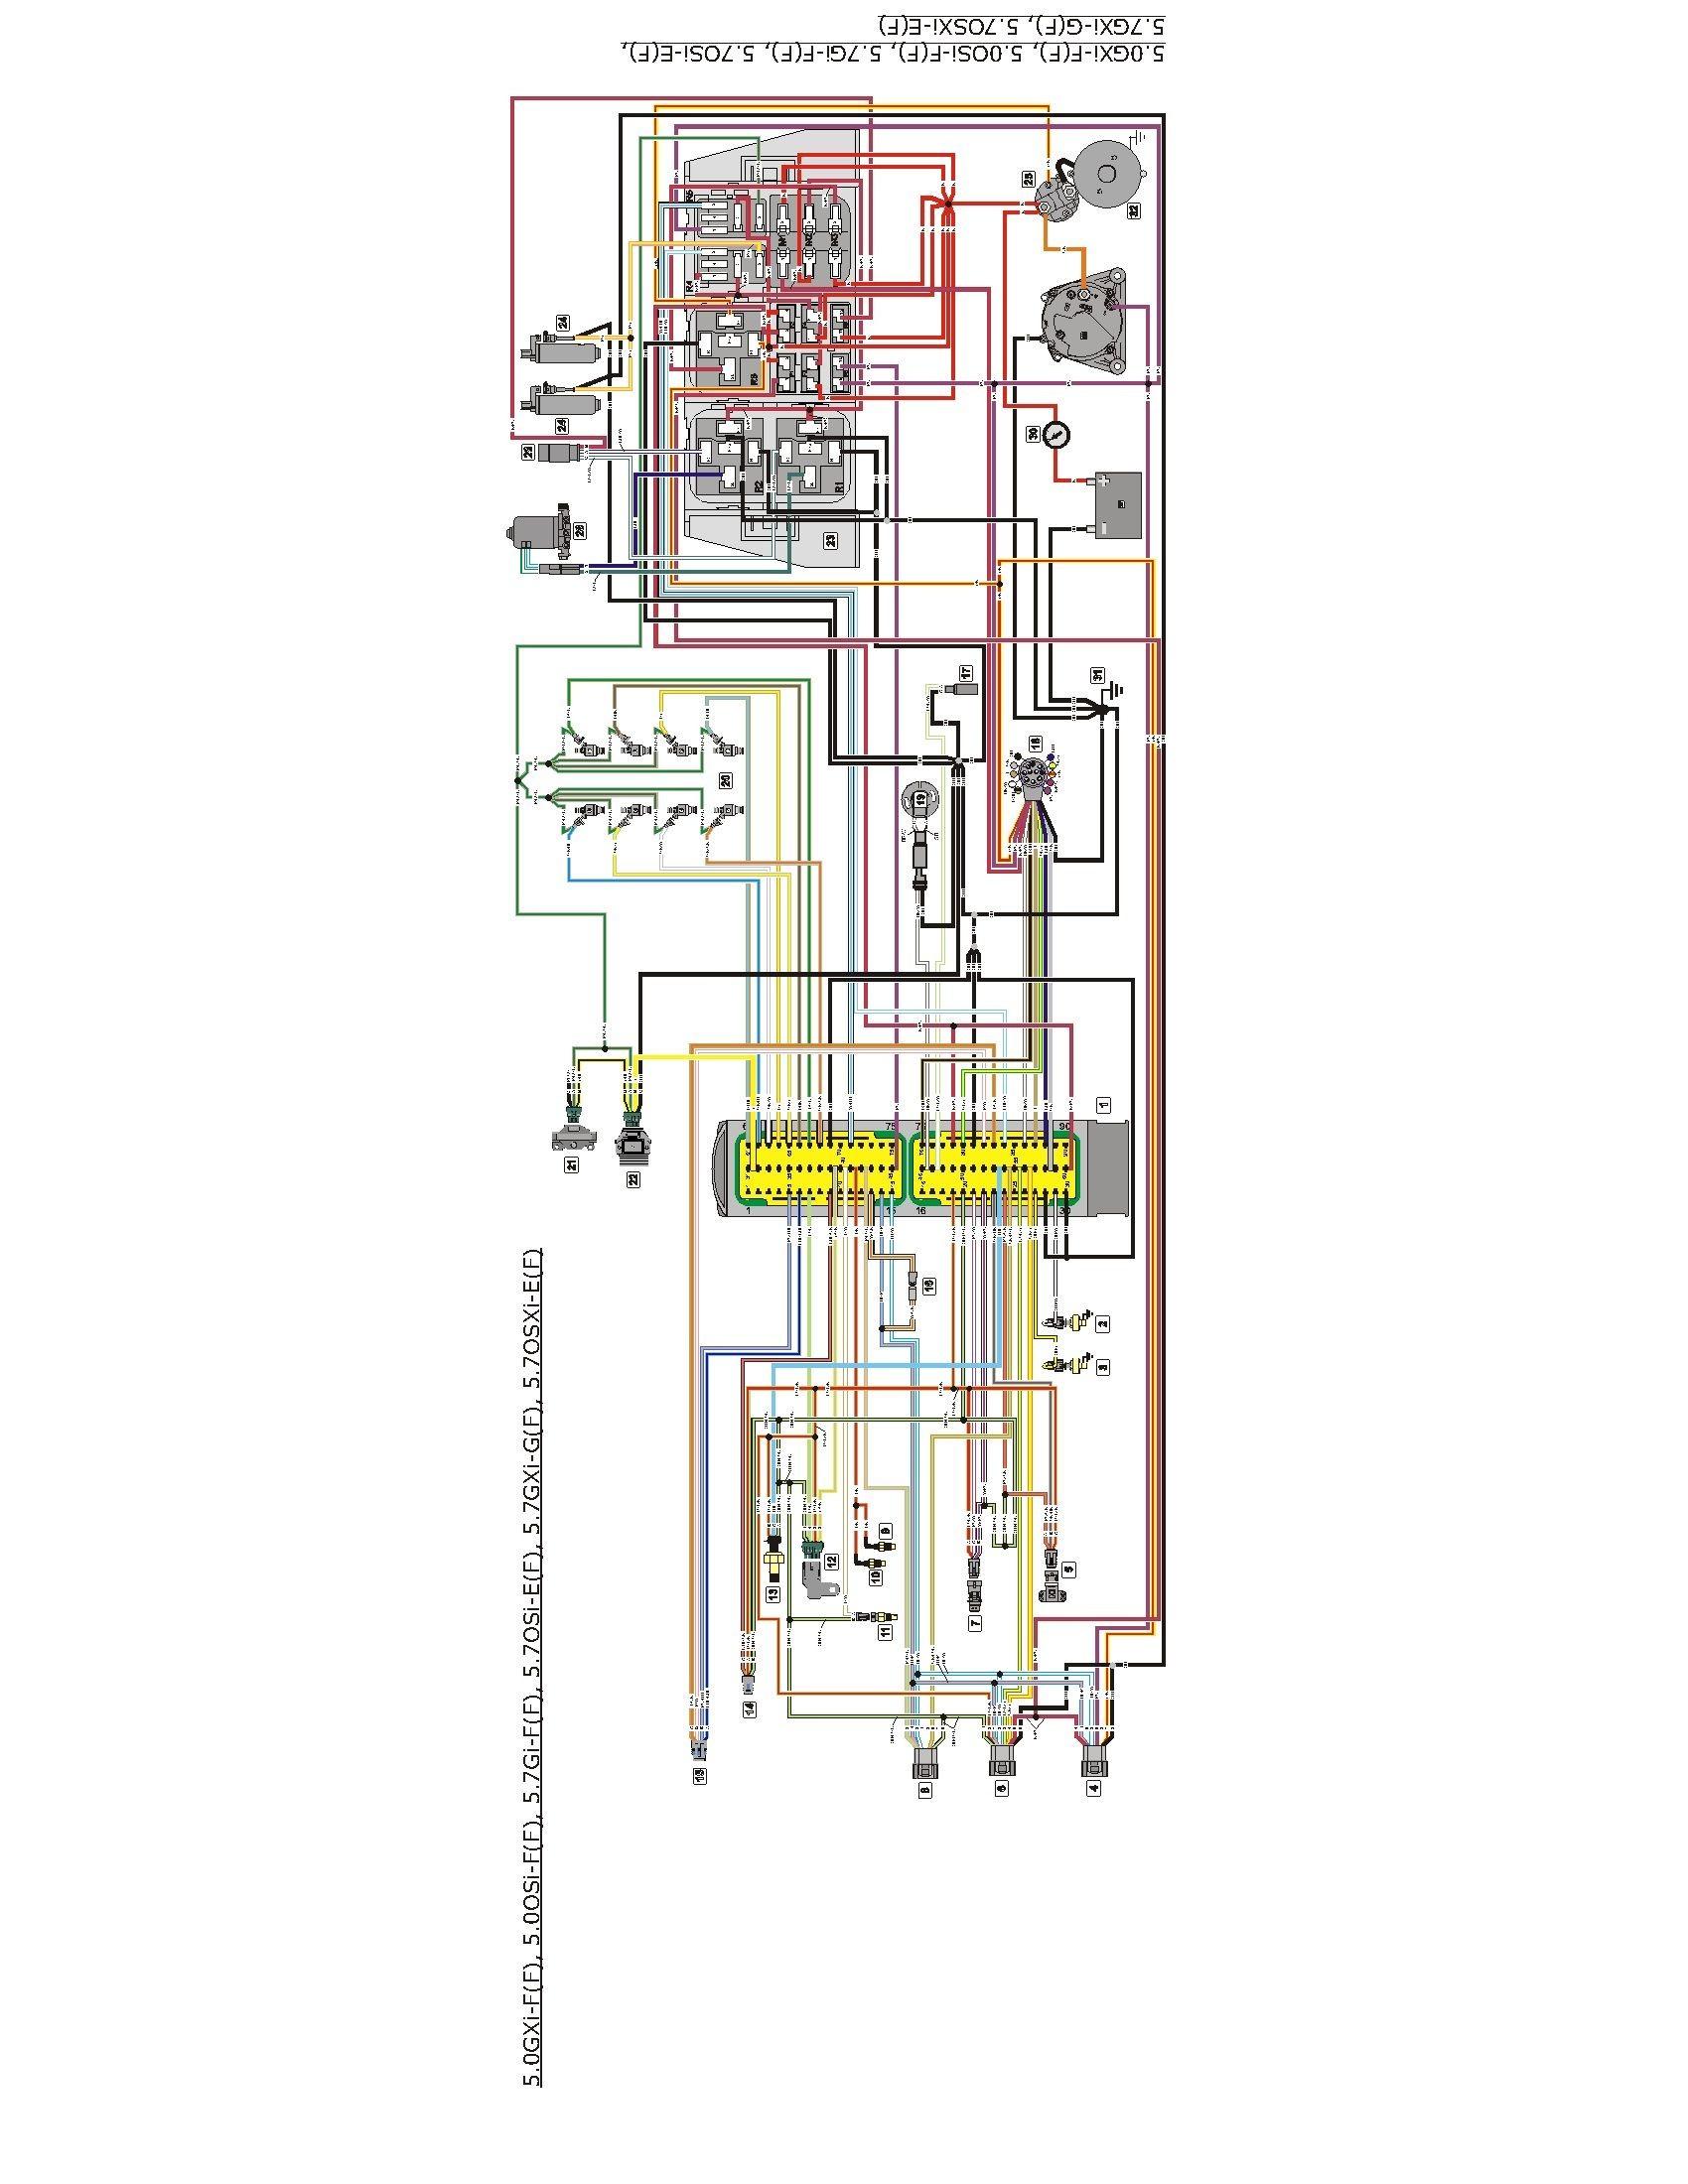 Indmar Marine Engine Wiring Diagram - Wiring Diagram And ... on